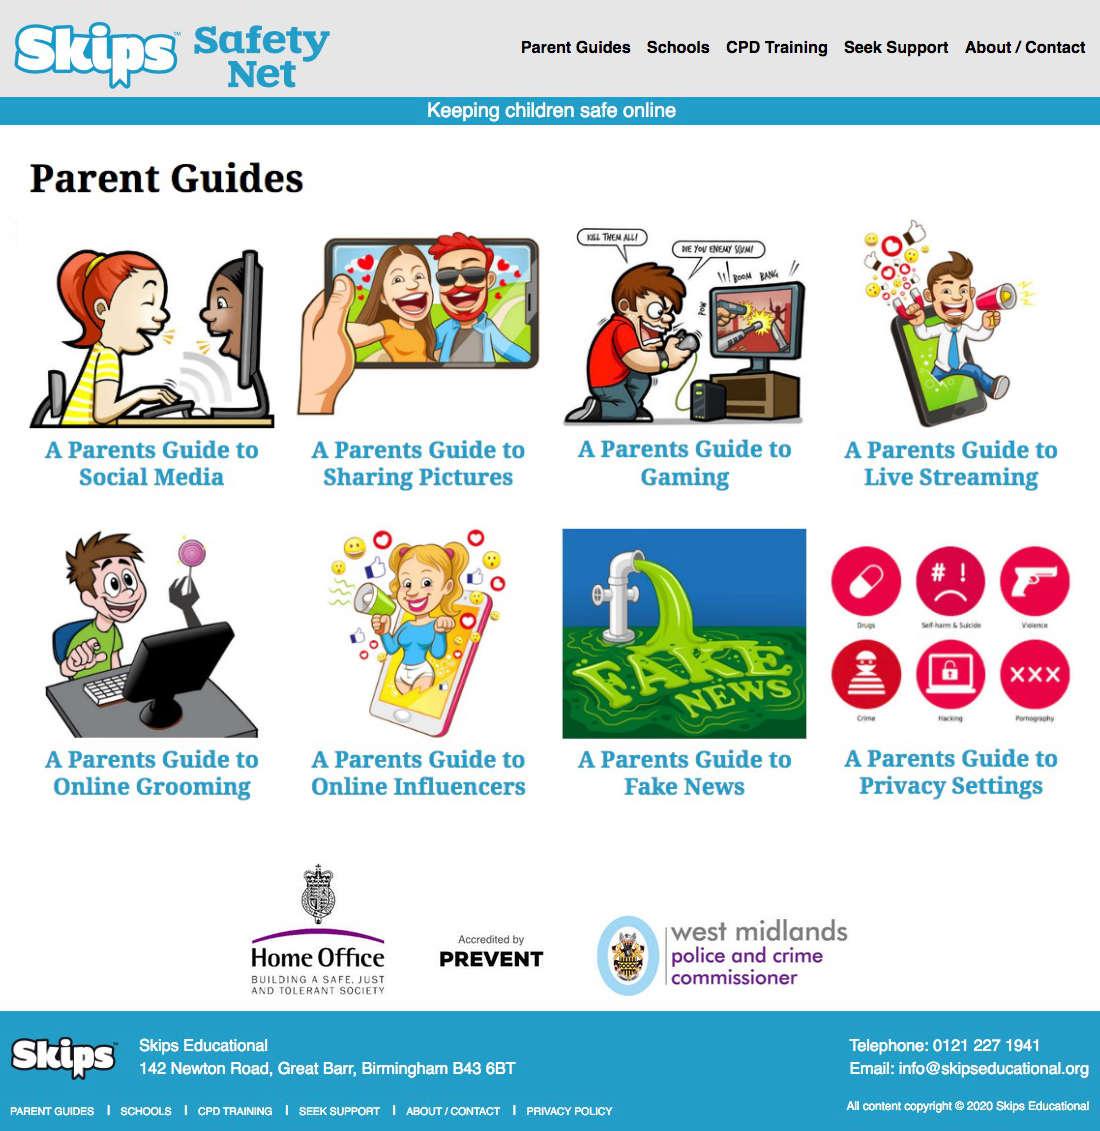 skips safety net website